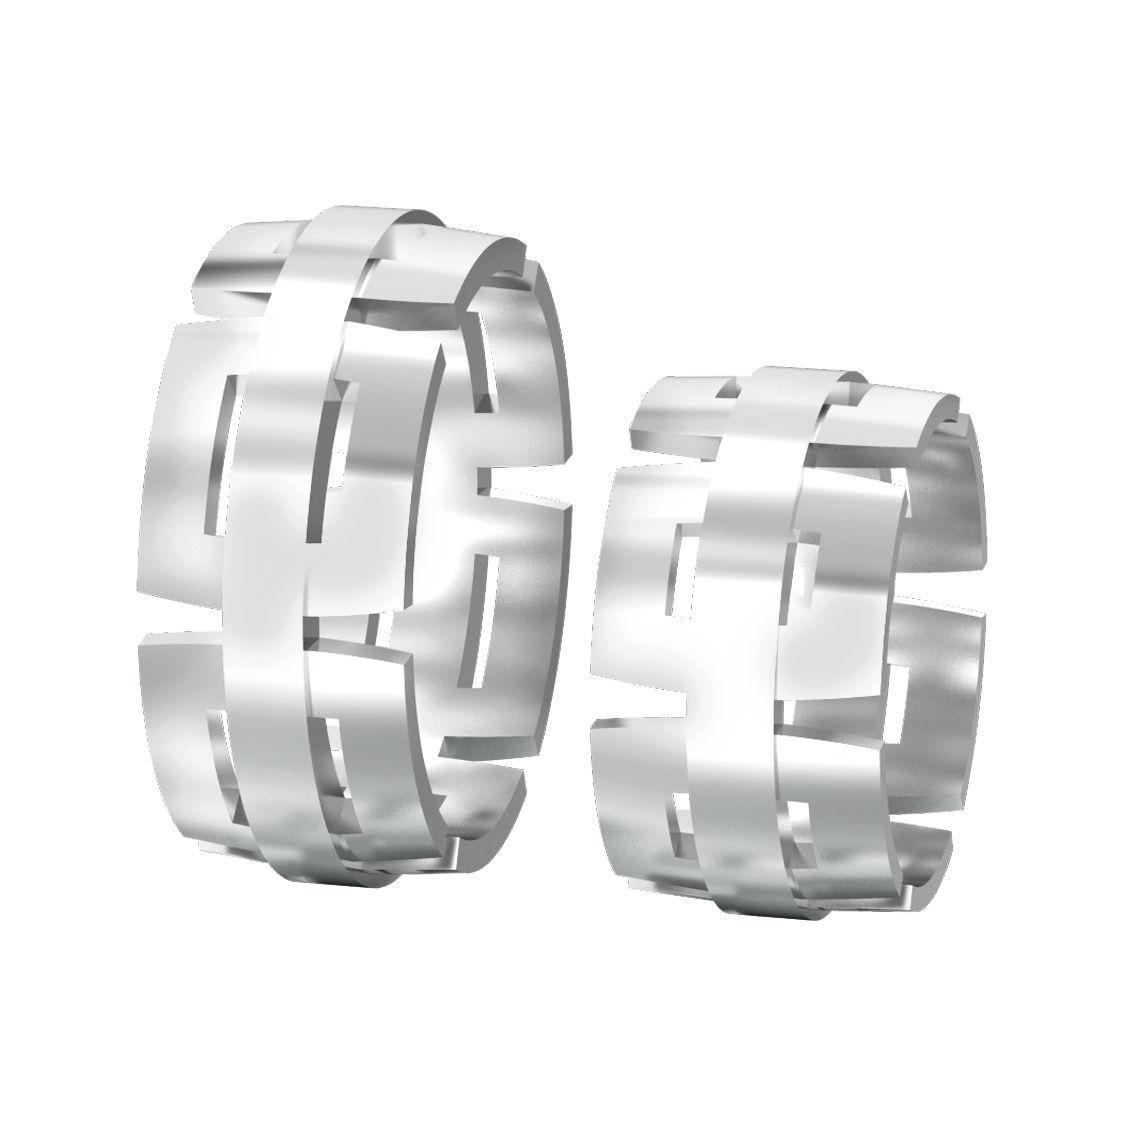 Model Set Of Two Geometric Wedding Rings